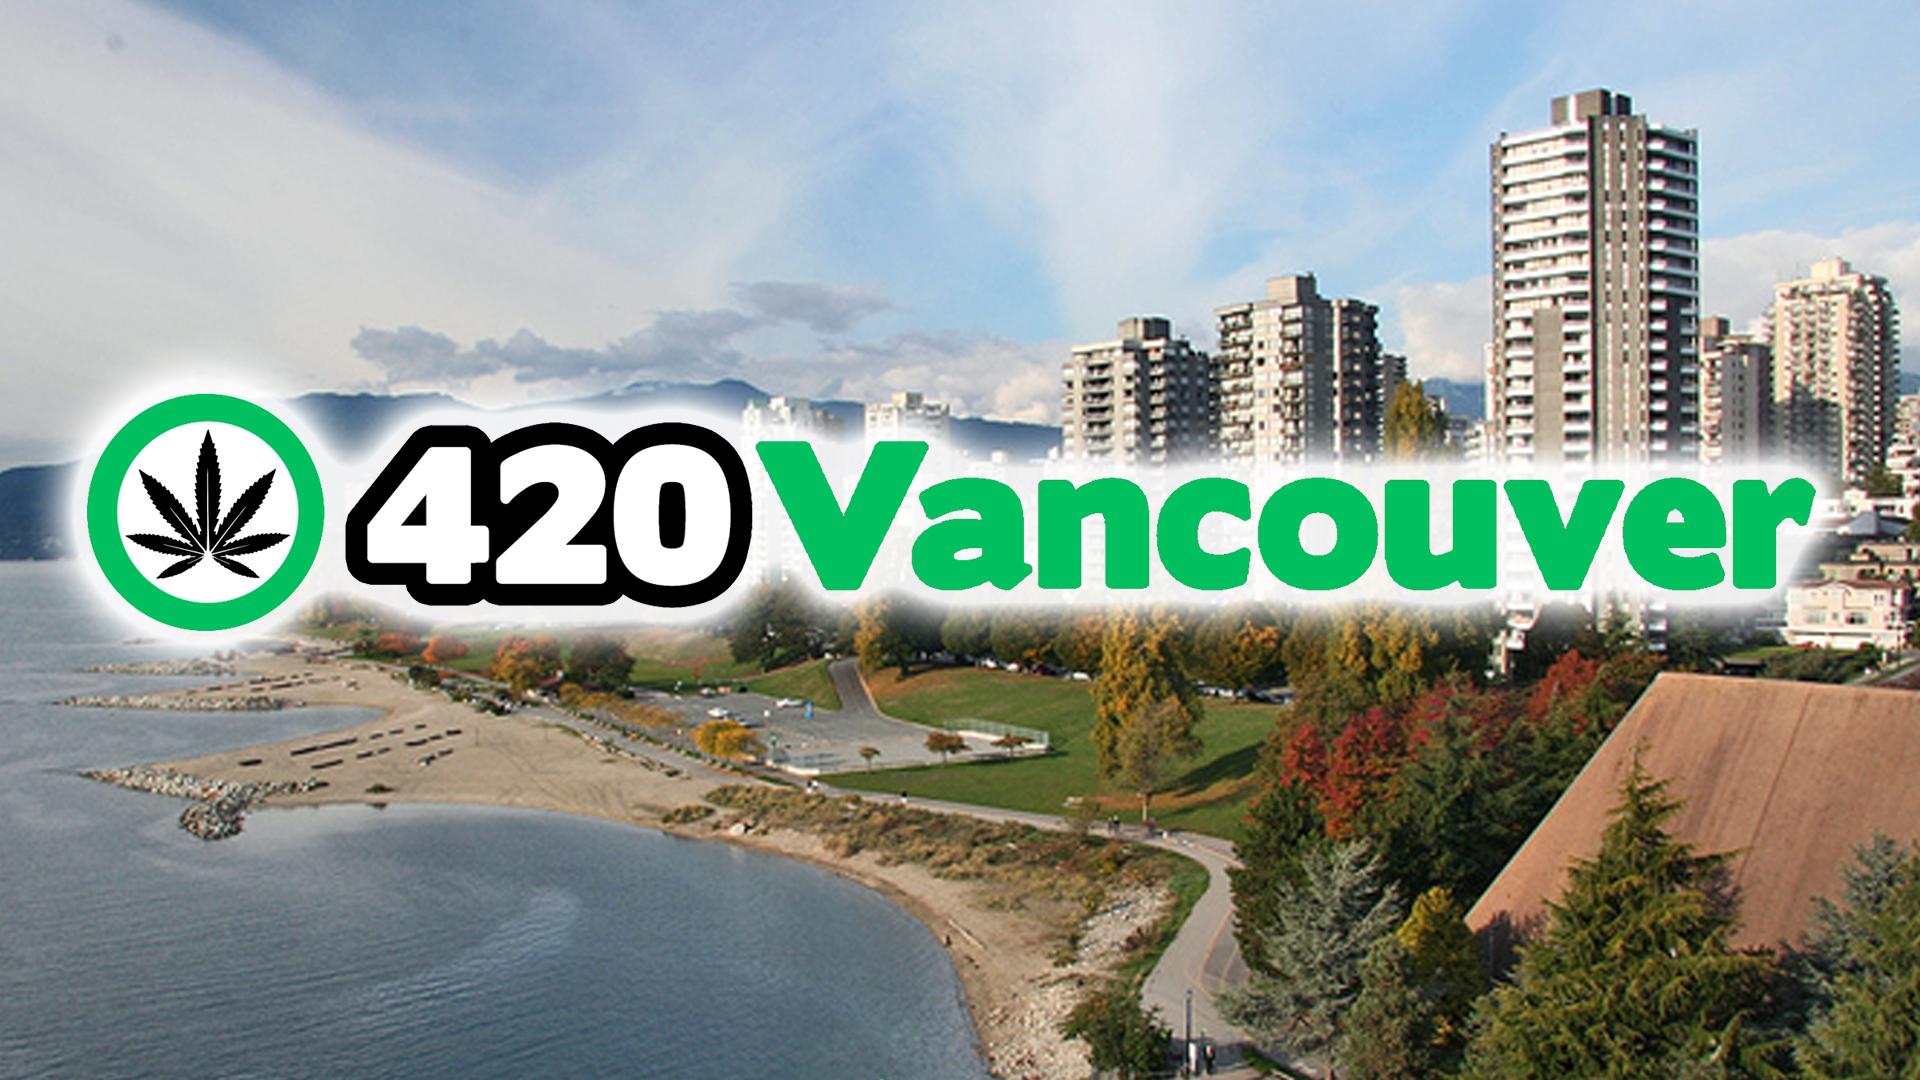 vancouver 420 sunset beach